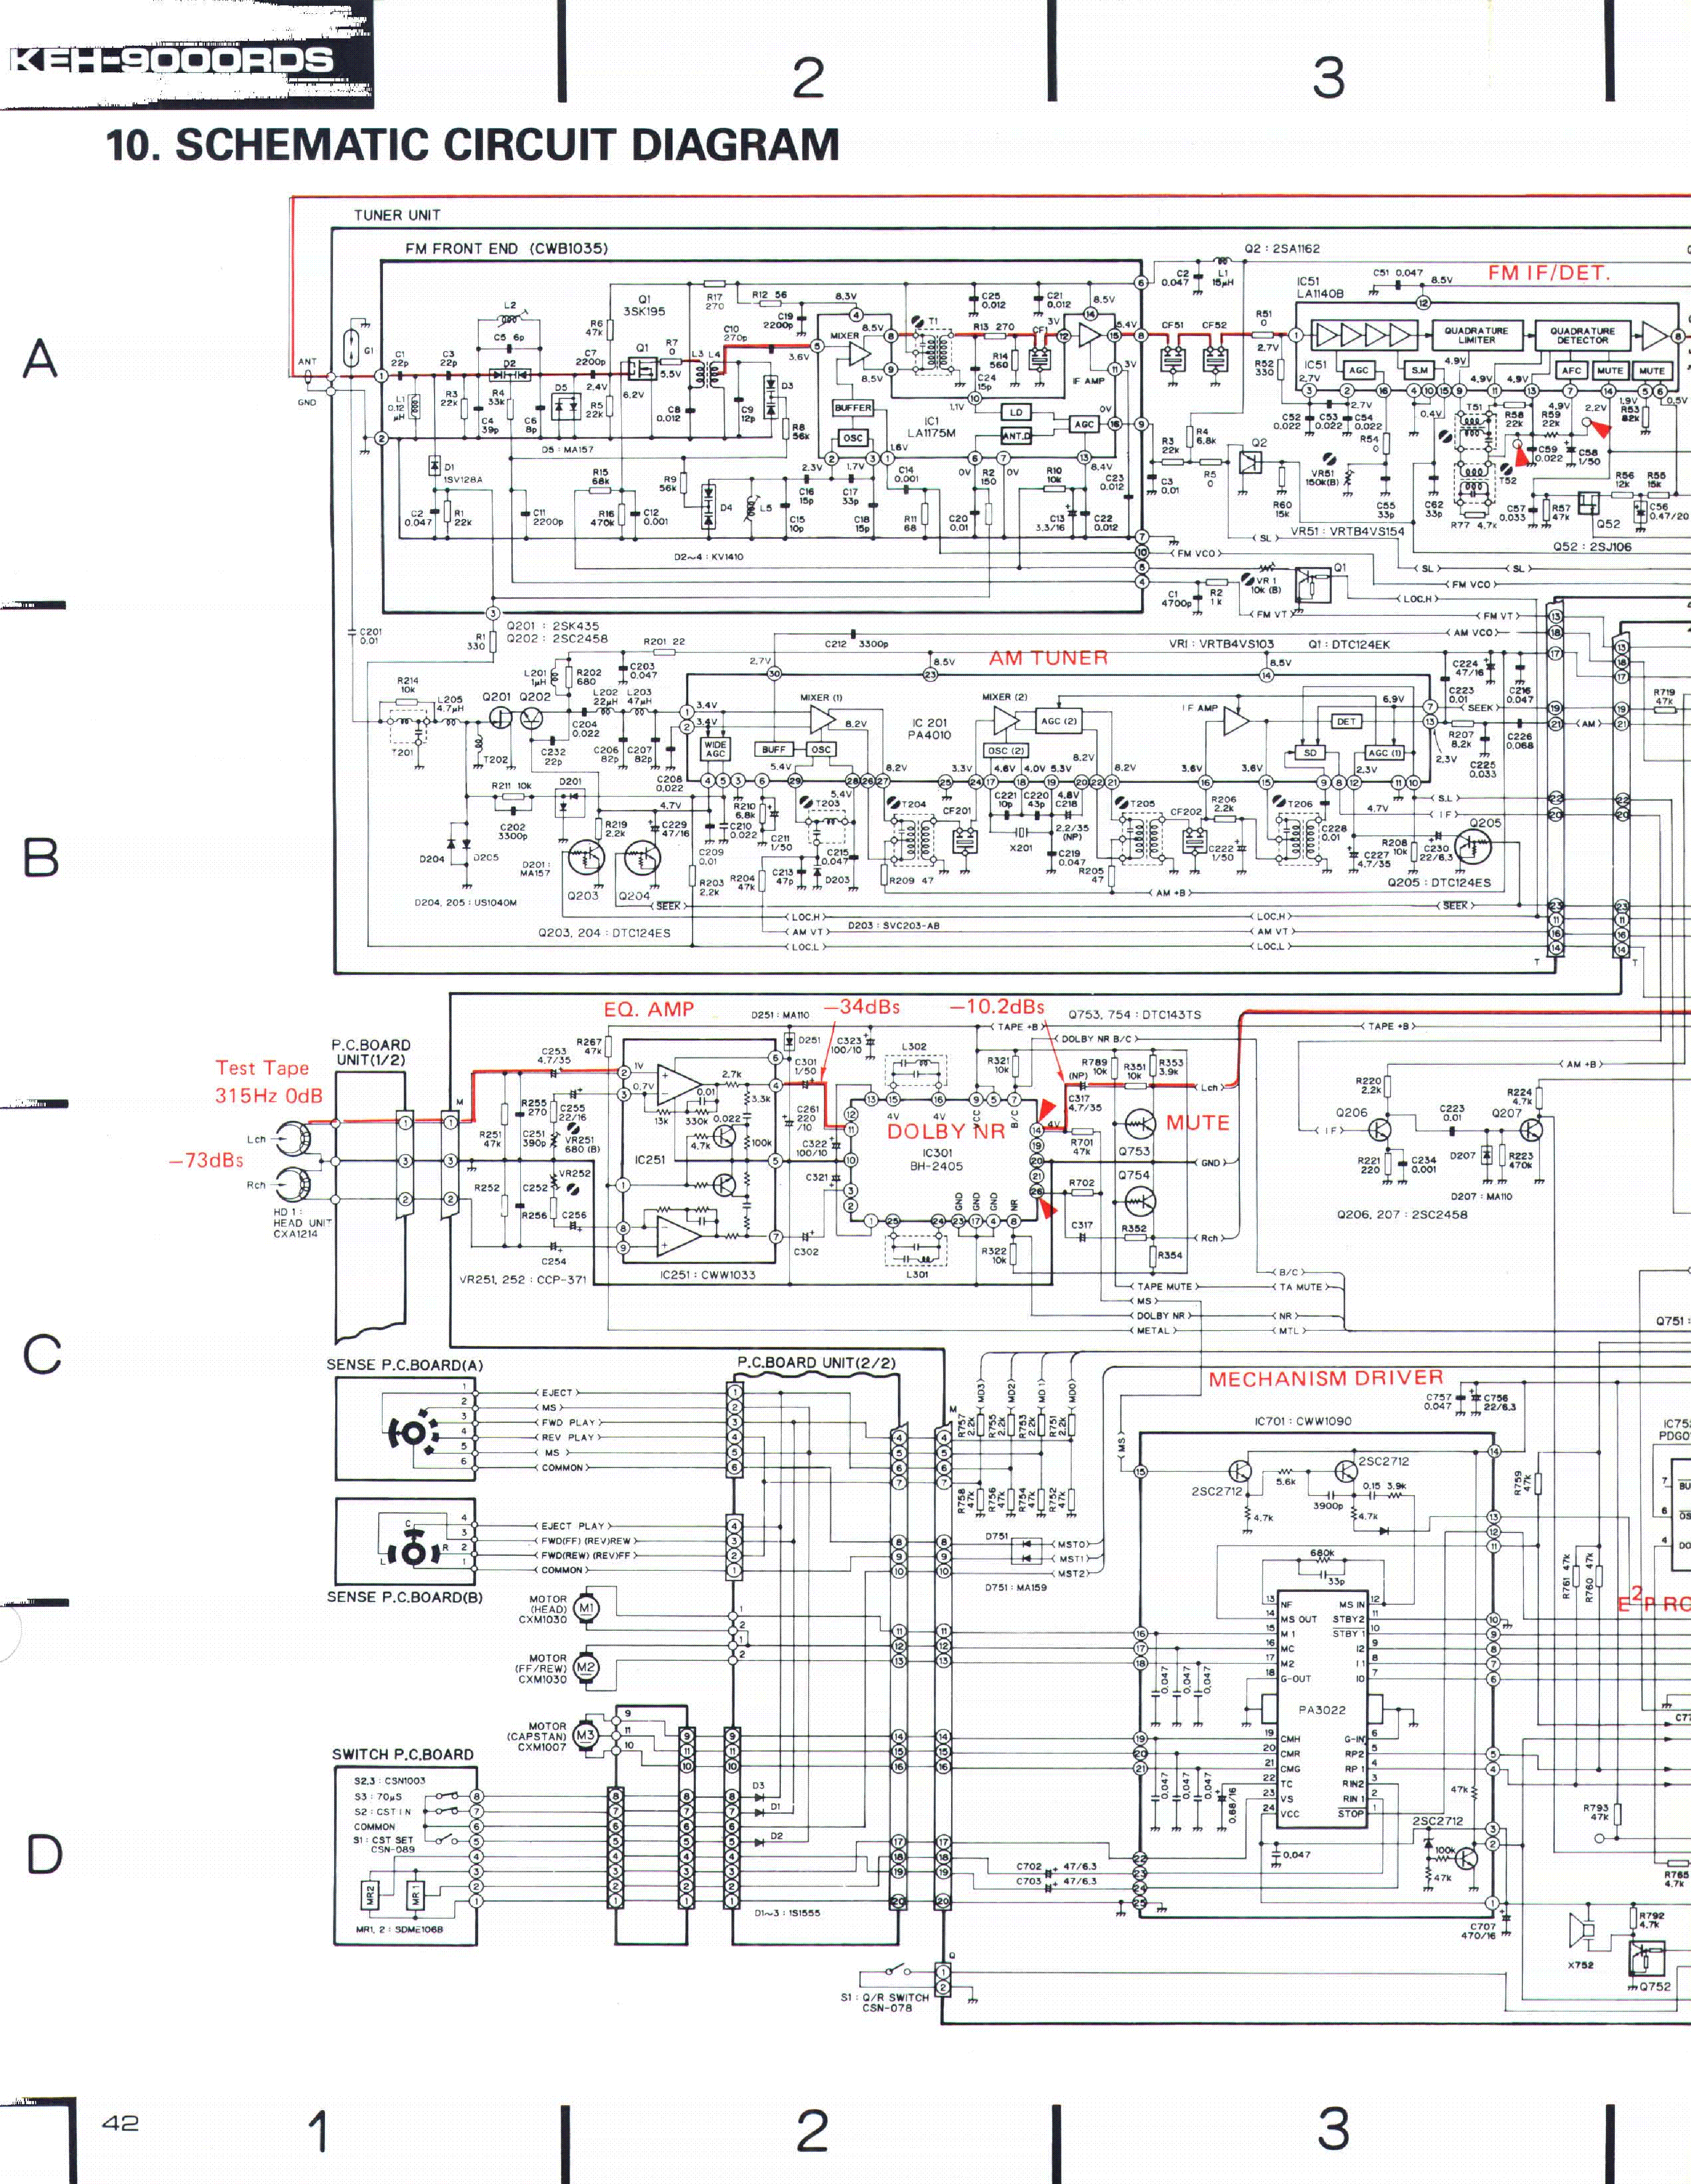 Pioneer Rds Radio Wiring Diagram : Pioneer keh rds sch service manual download